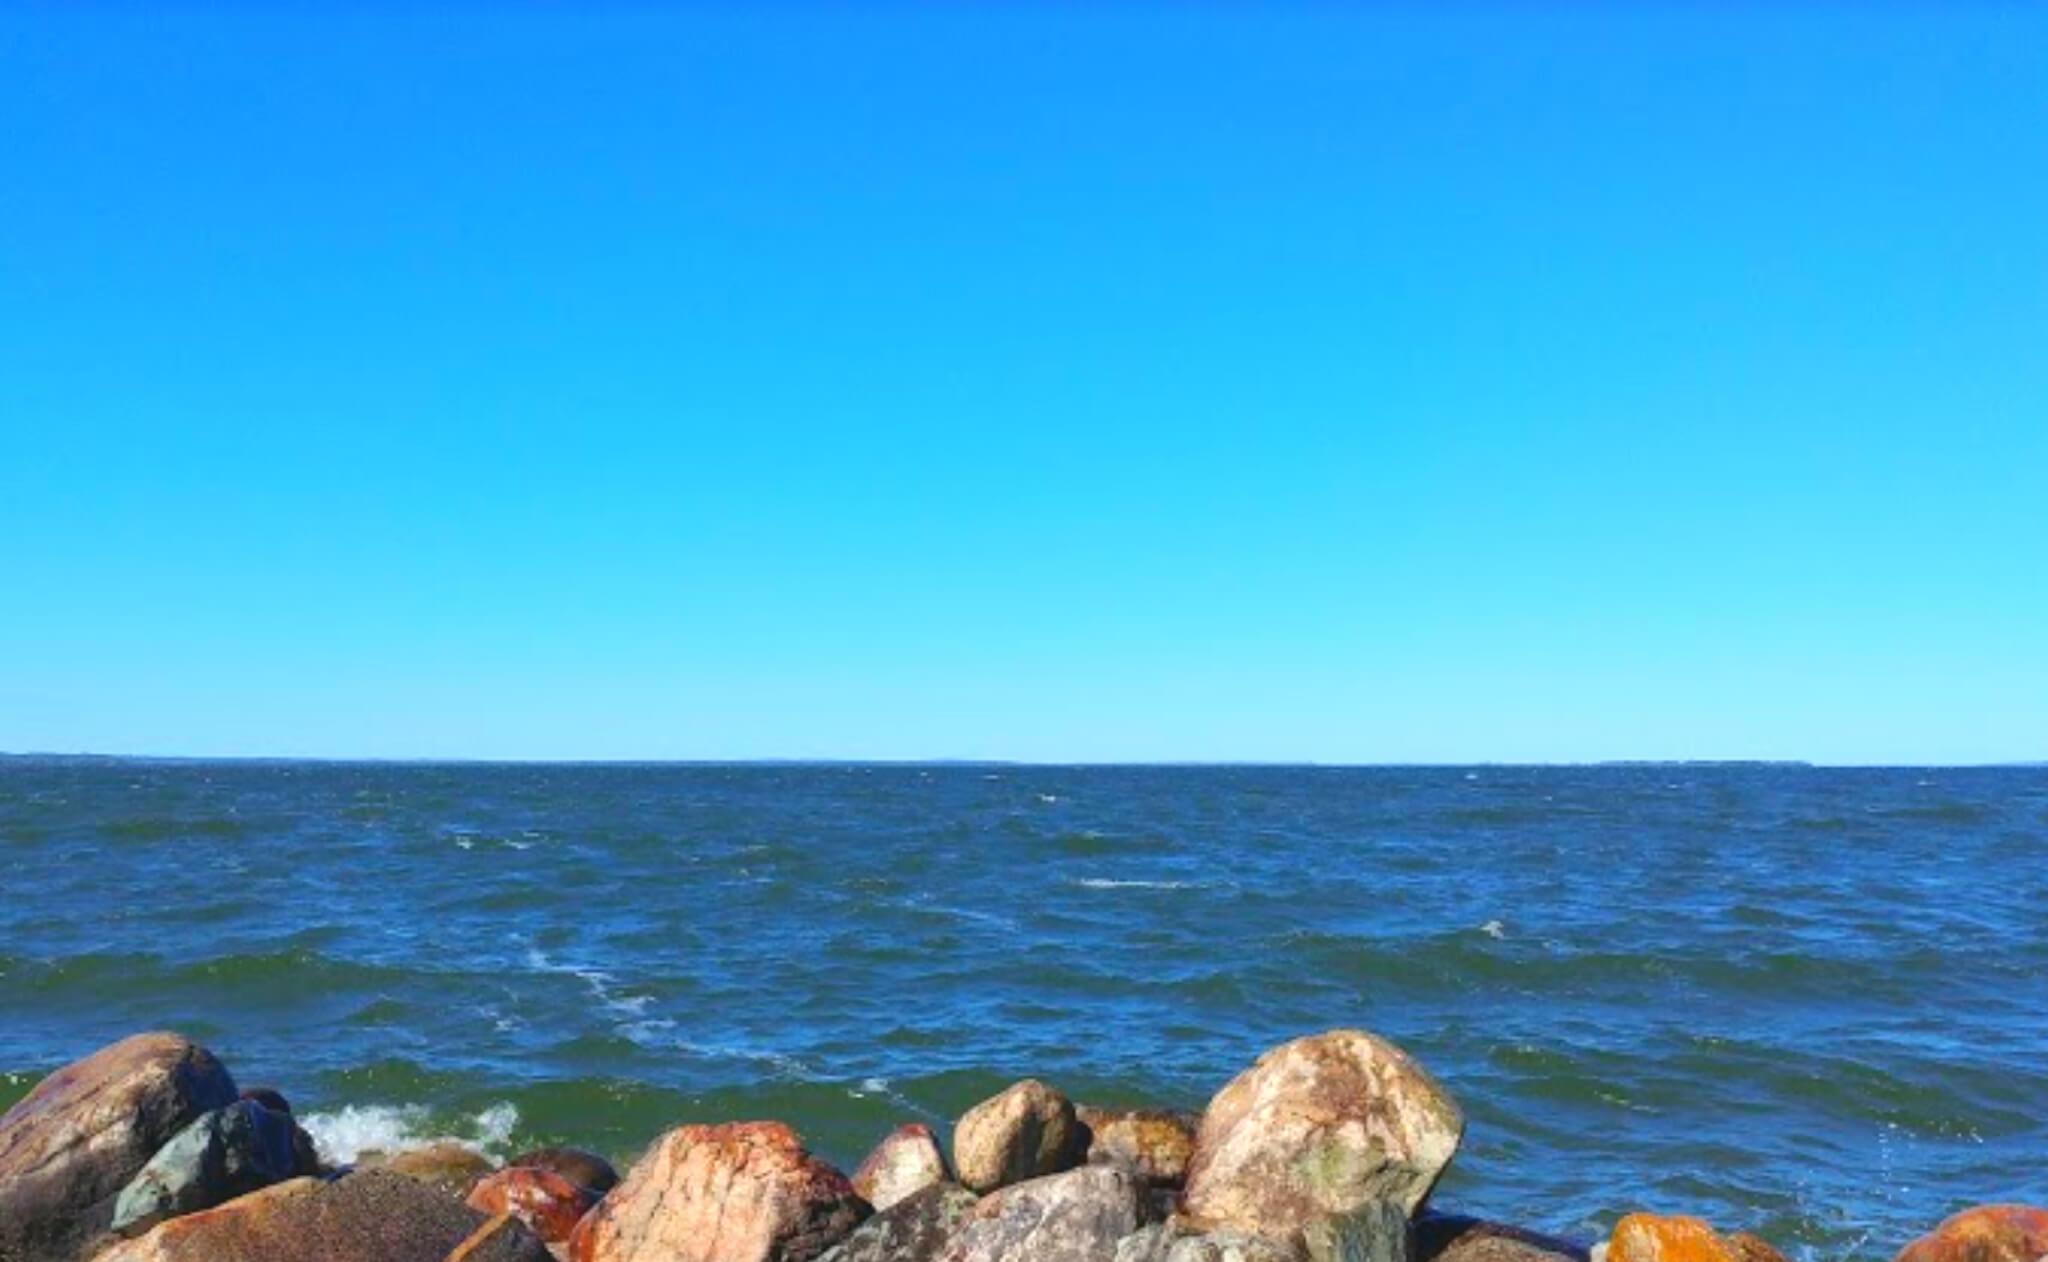 Leech-Lake-Fishing-Report-Guide-Minnesota-MN-01-1